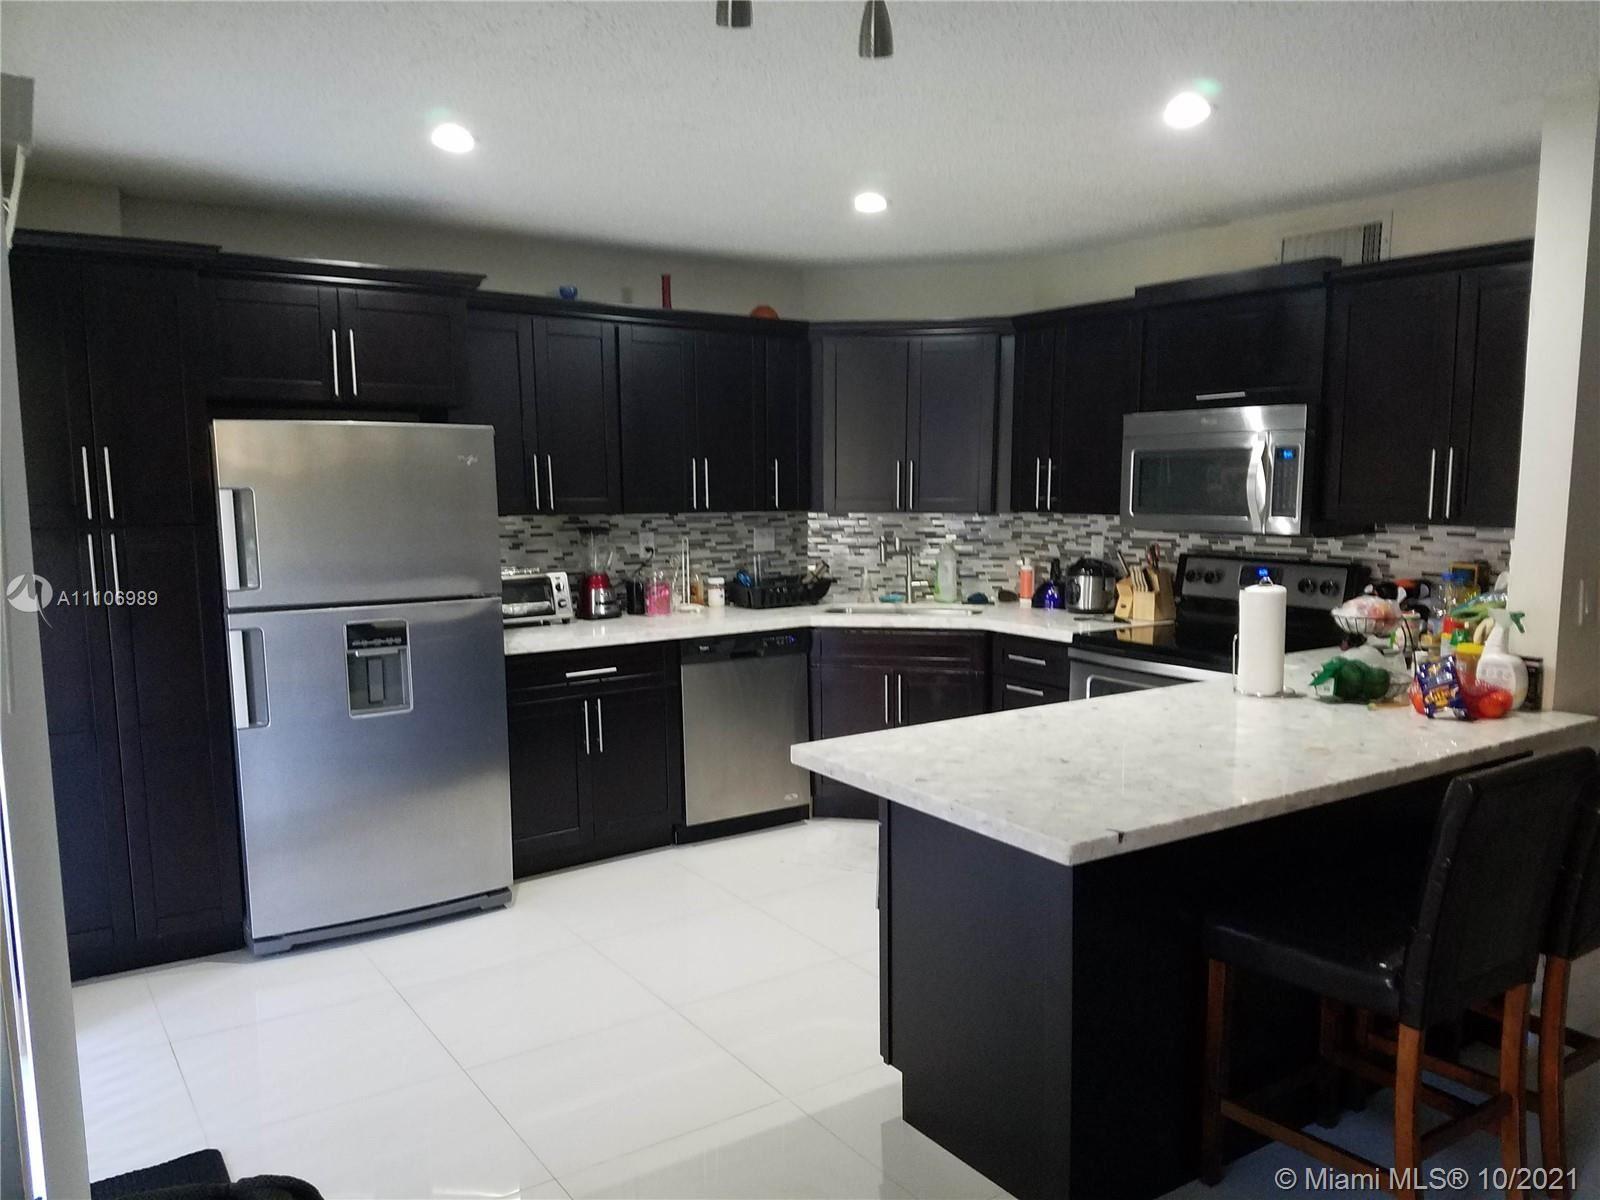 6745 SW 132nd Ave #212, Miami, FL 33183 - #: A11106989